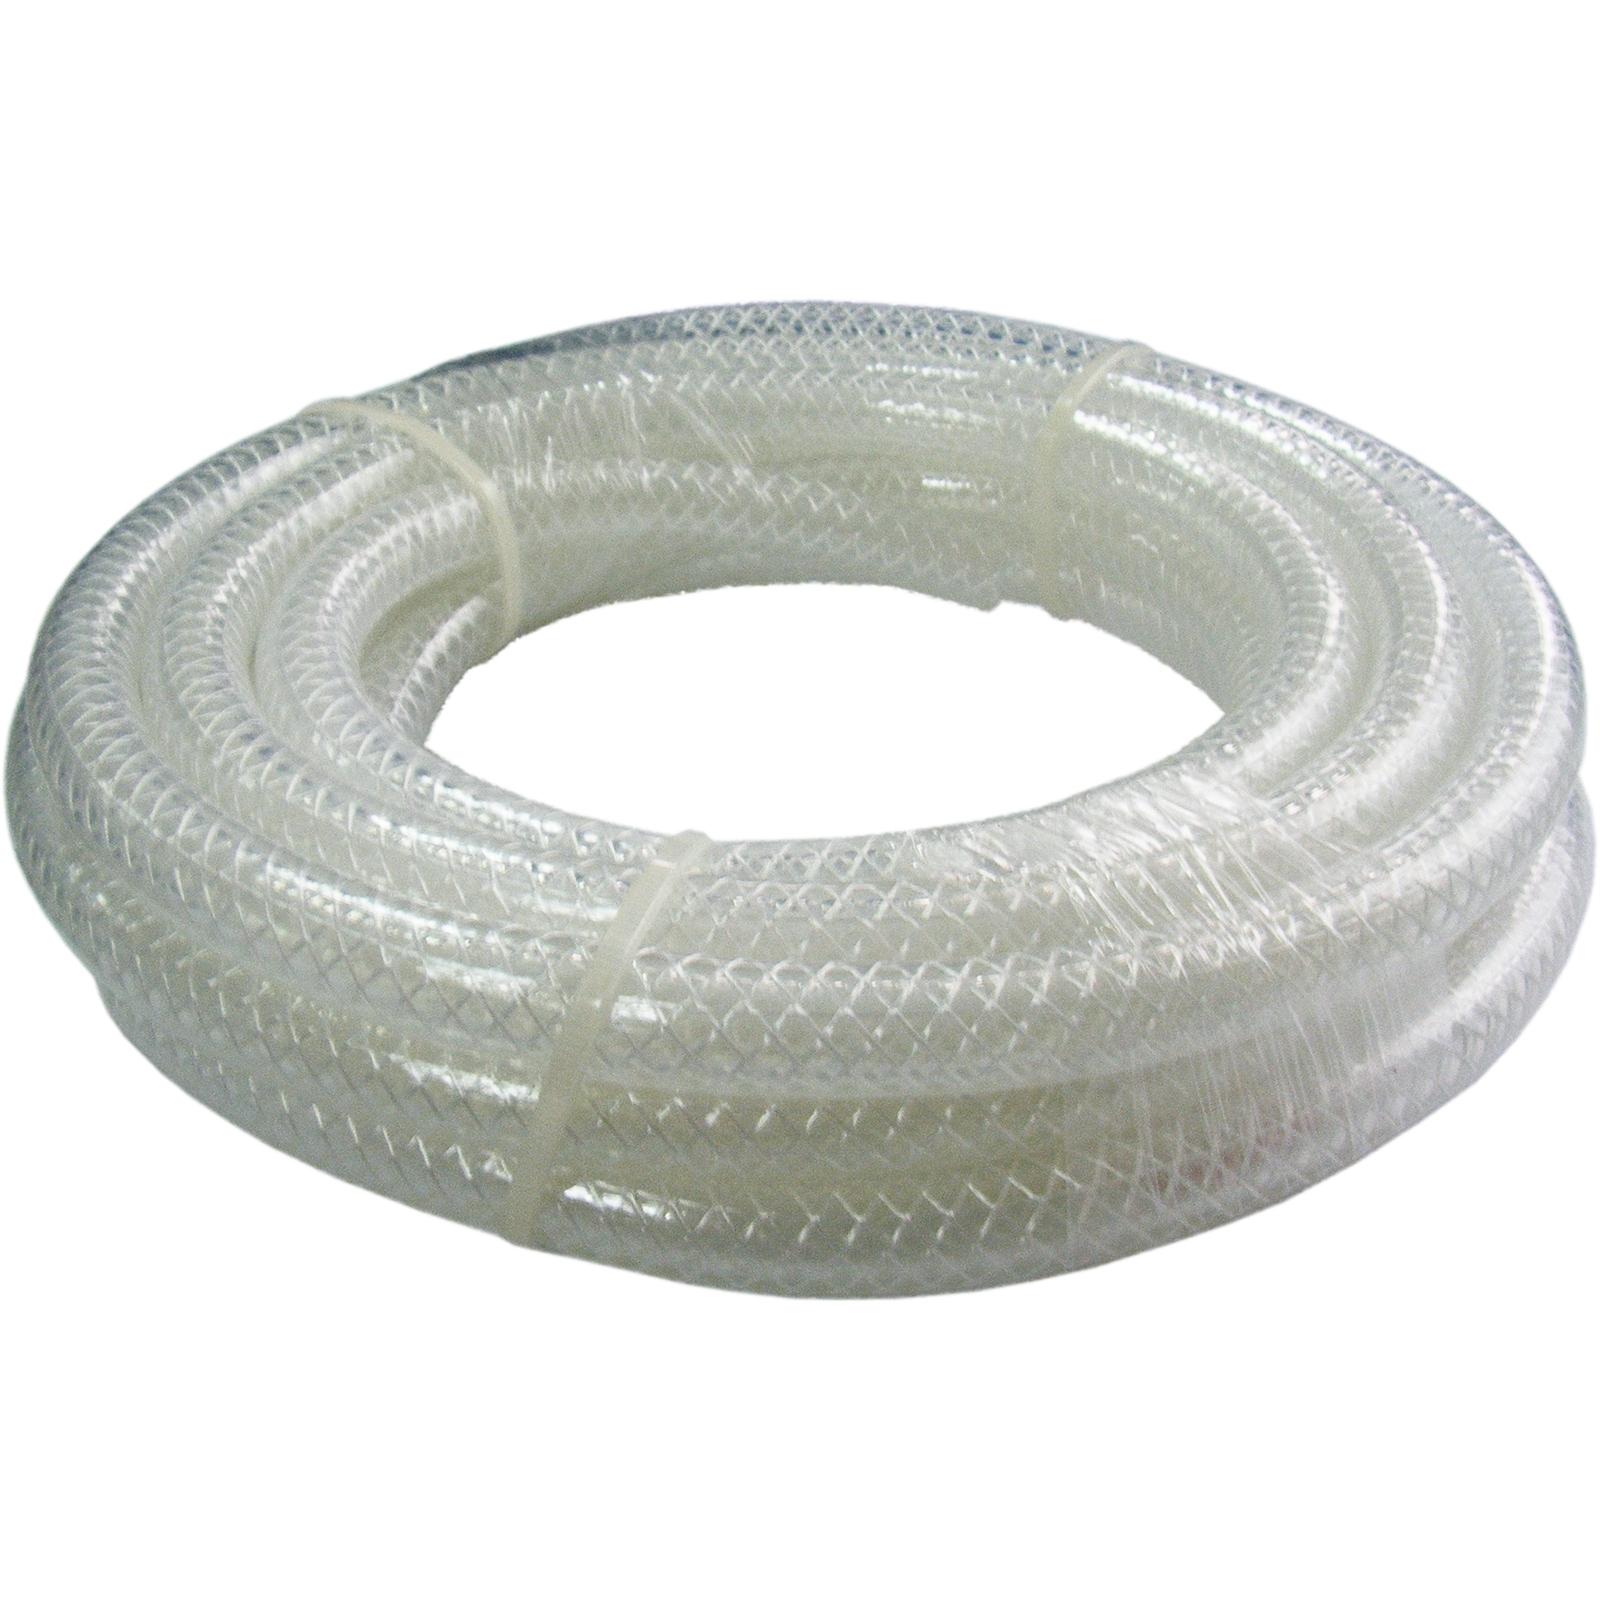 Kinetic 10mm x 2m Clear PVC Reinforced Plumbing Hose